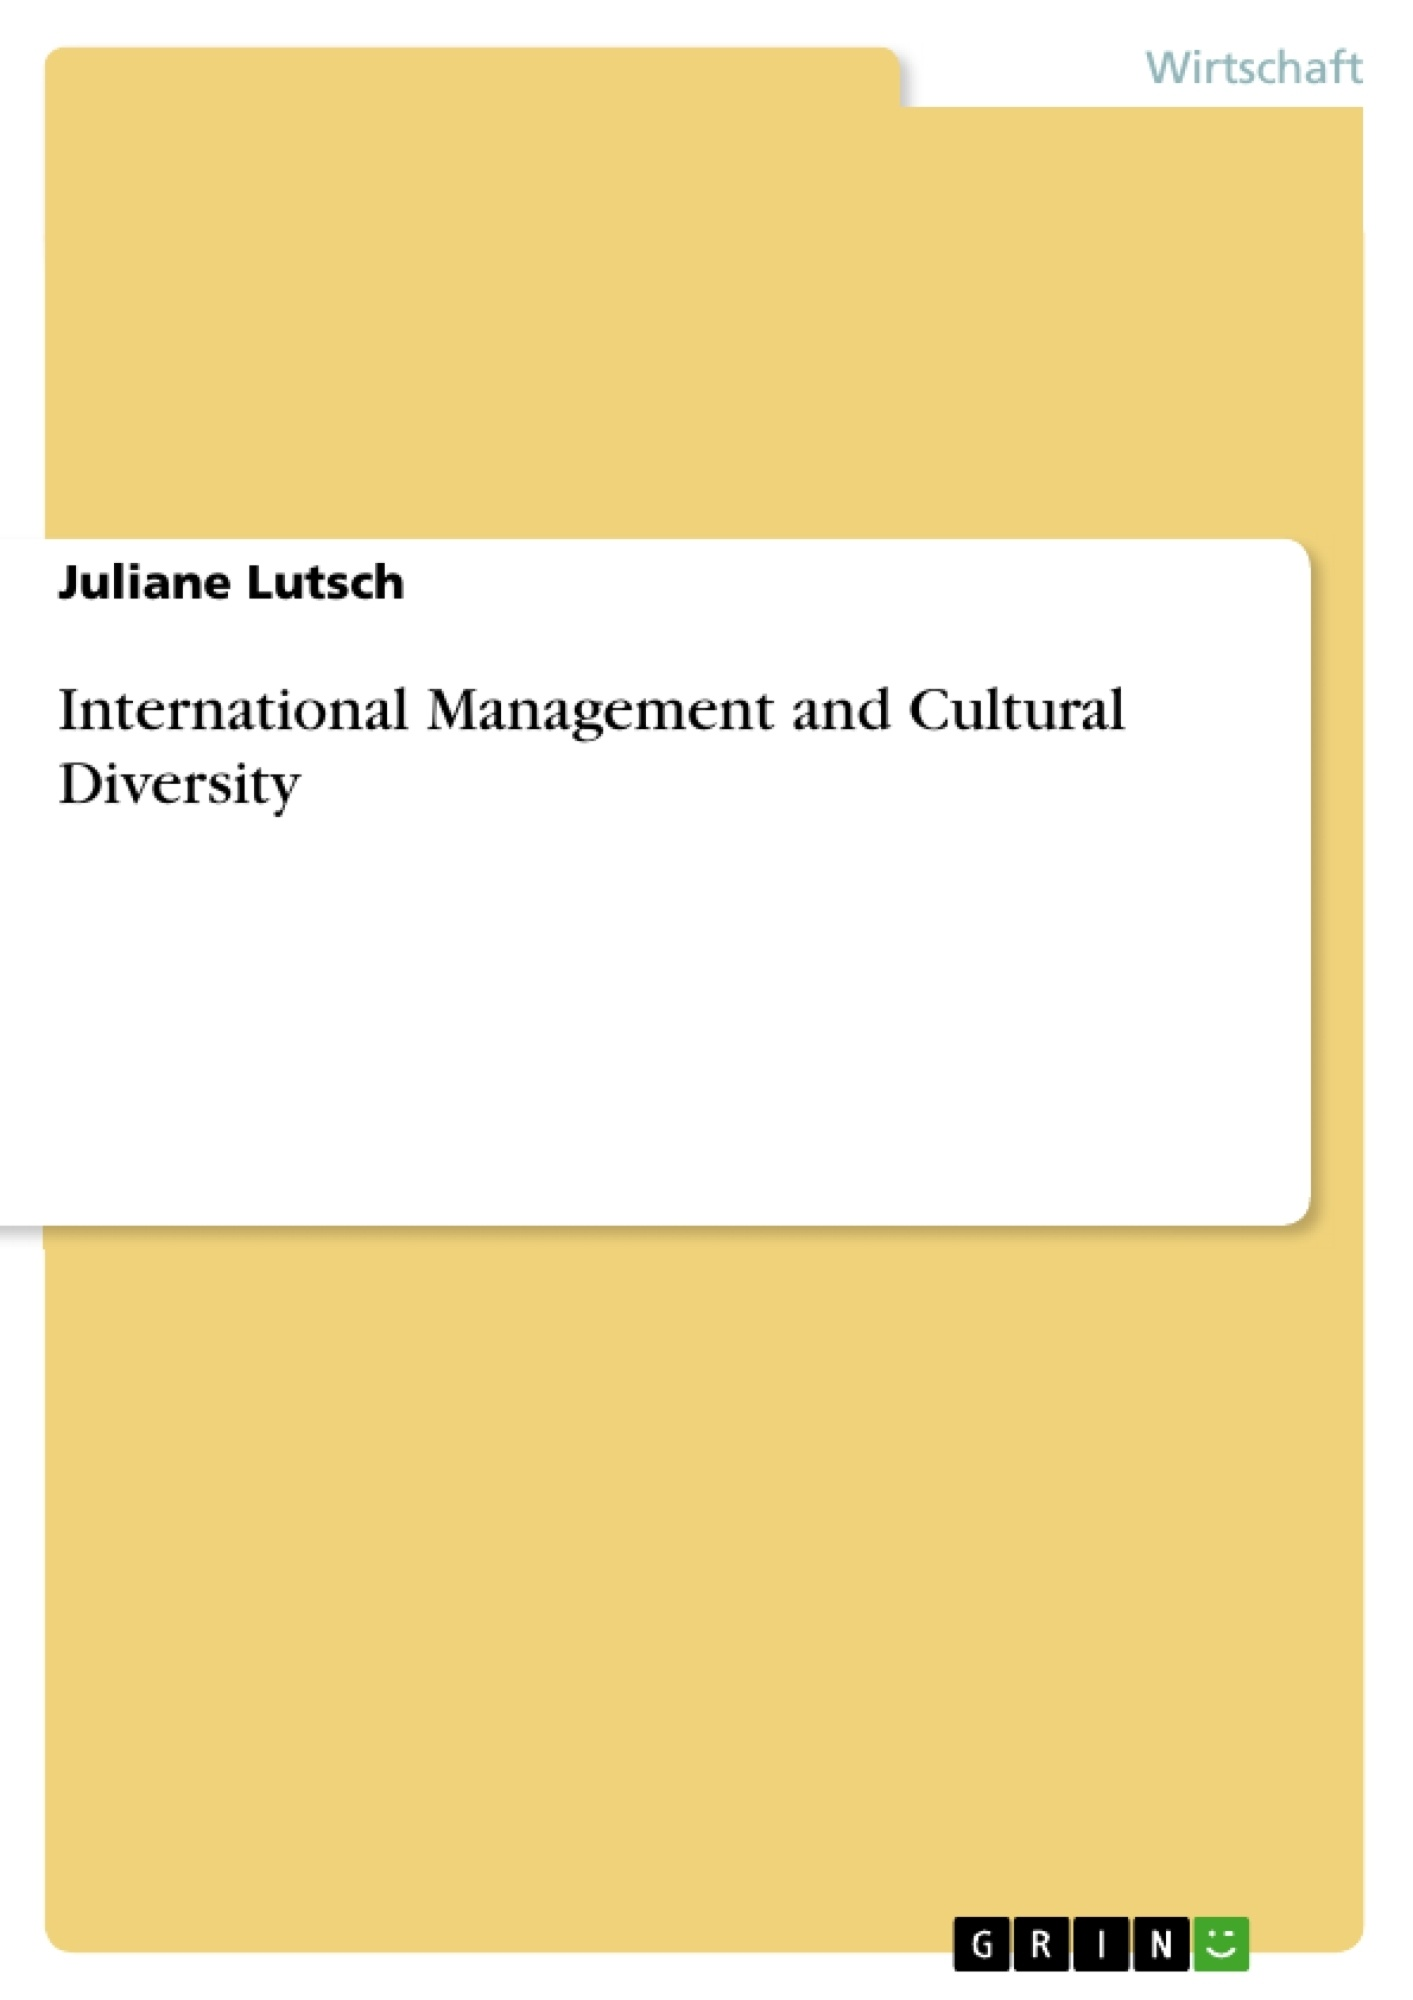 Titel: International Management and Cultural Diversity